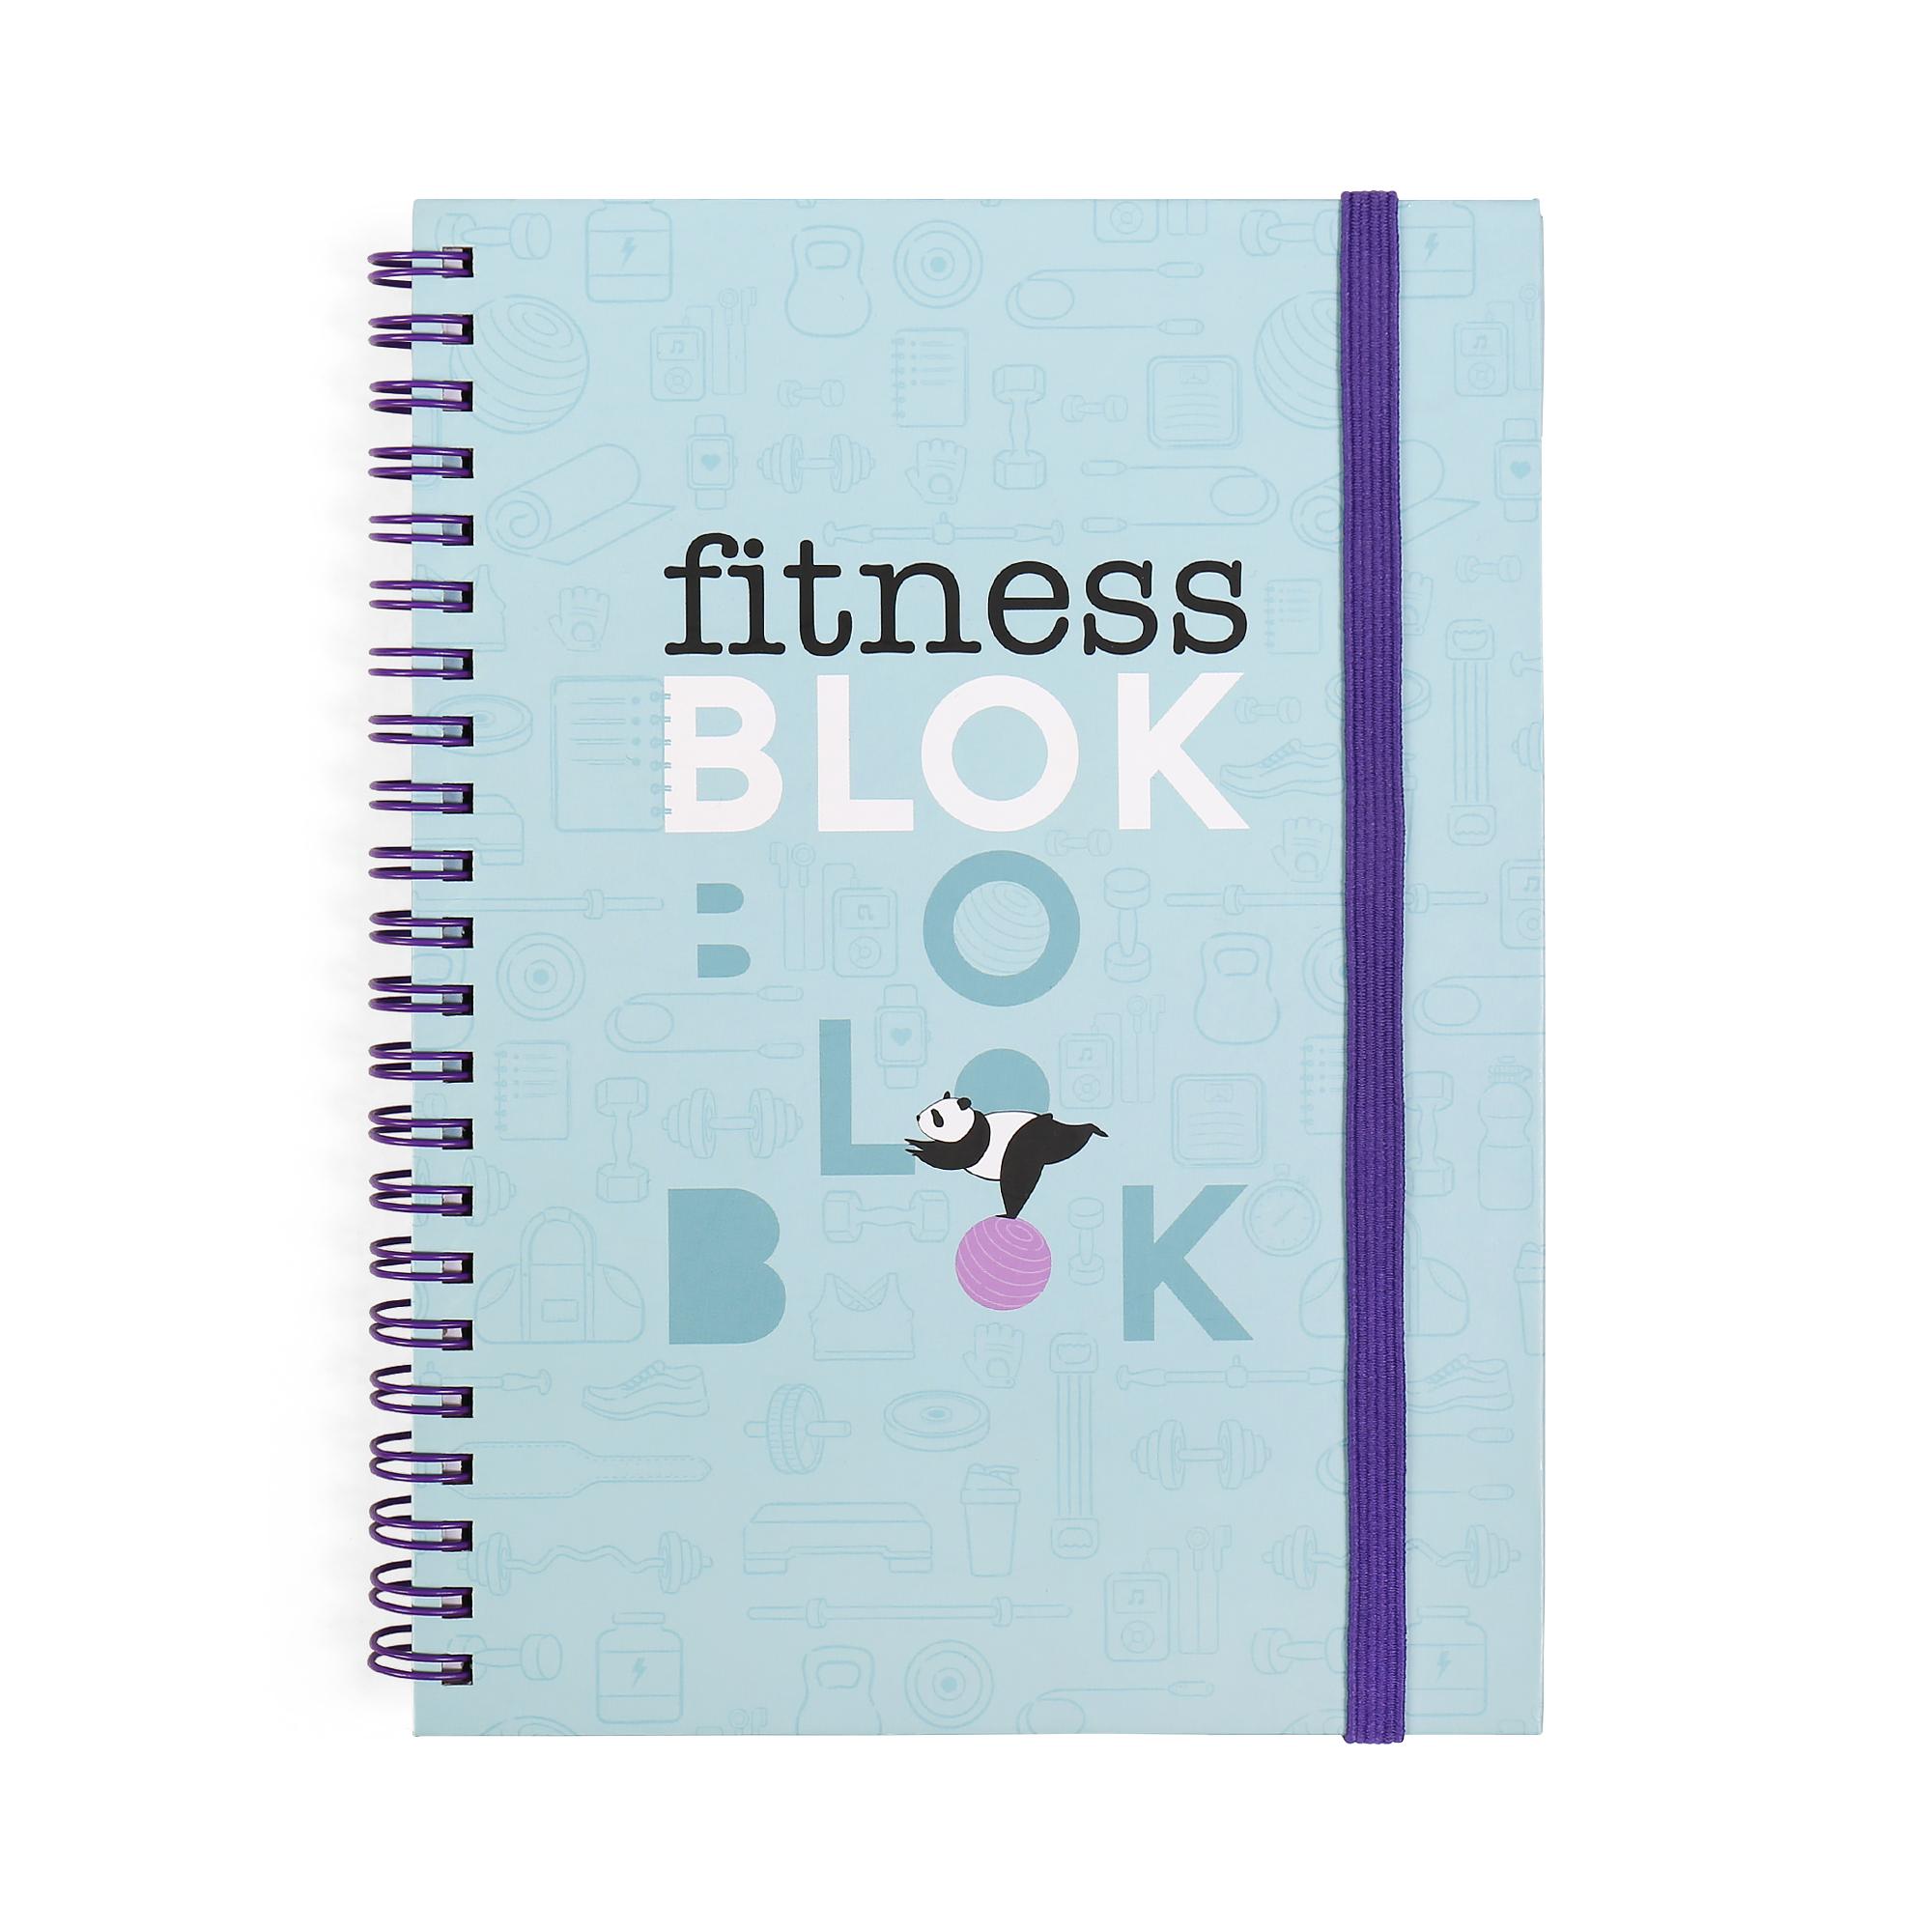 Fitness blok